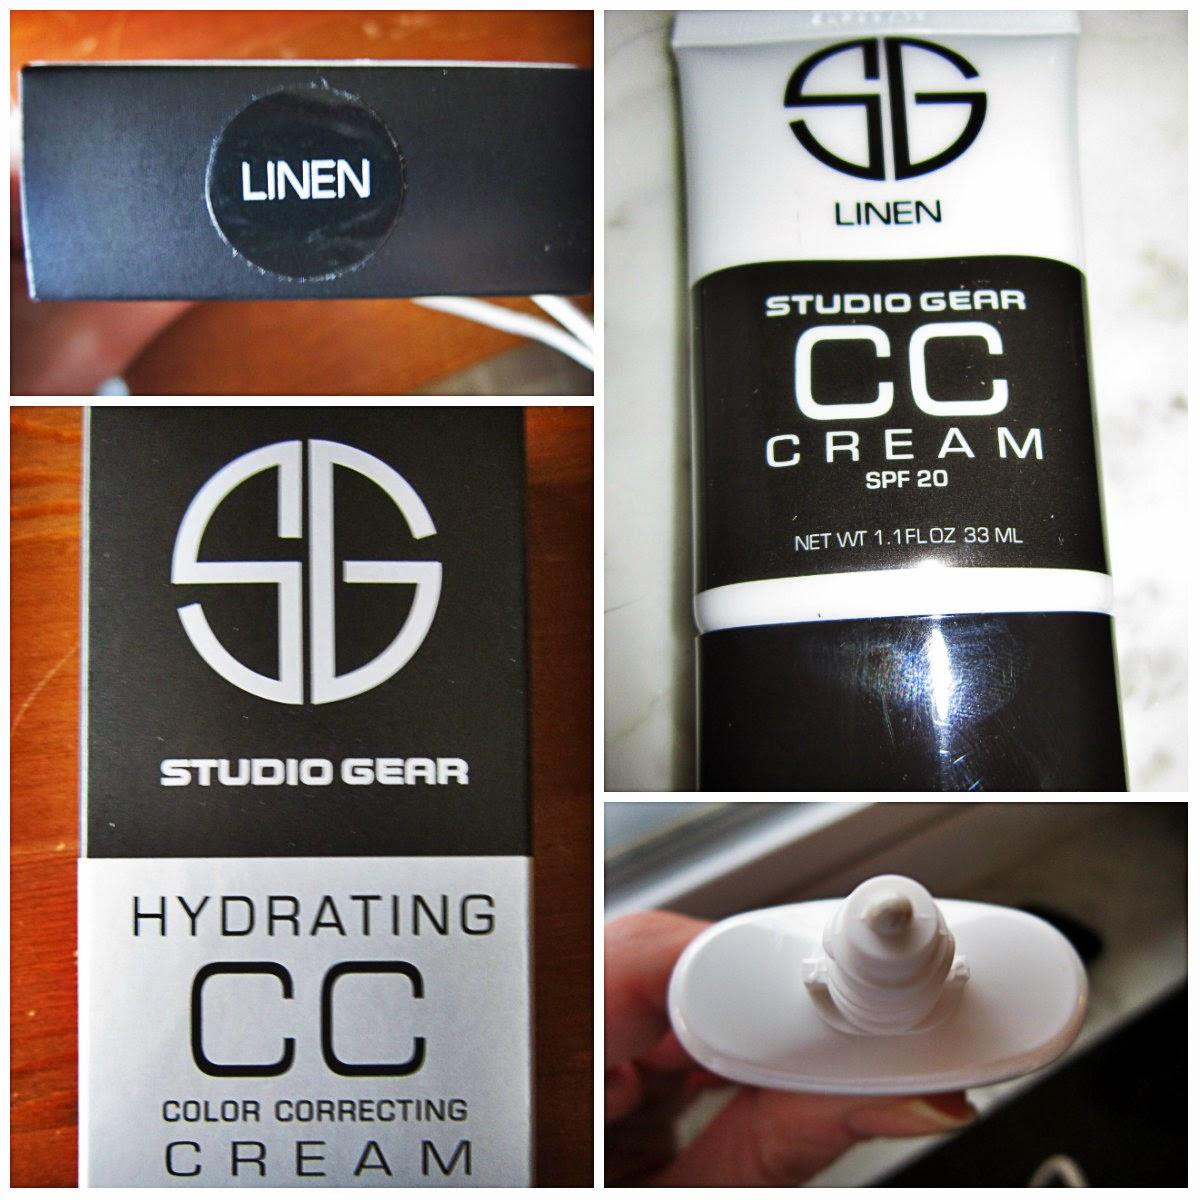 Studio Gear's Hydrating CC Cream